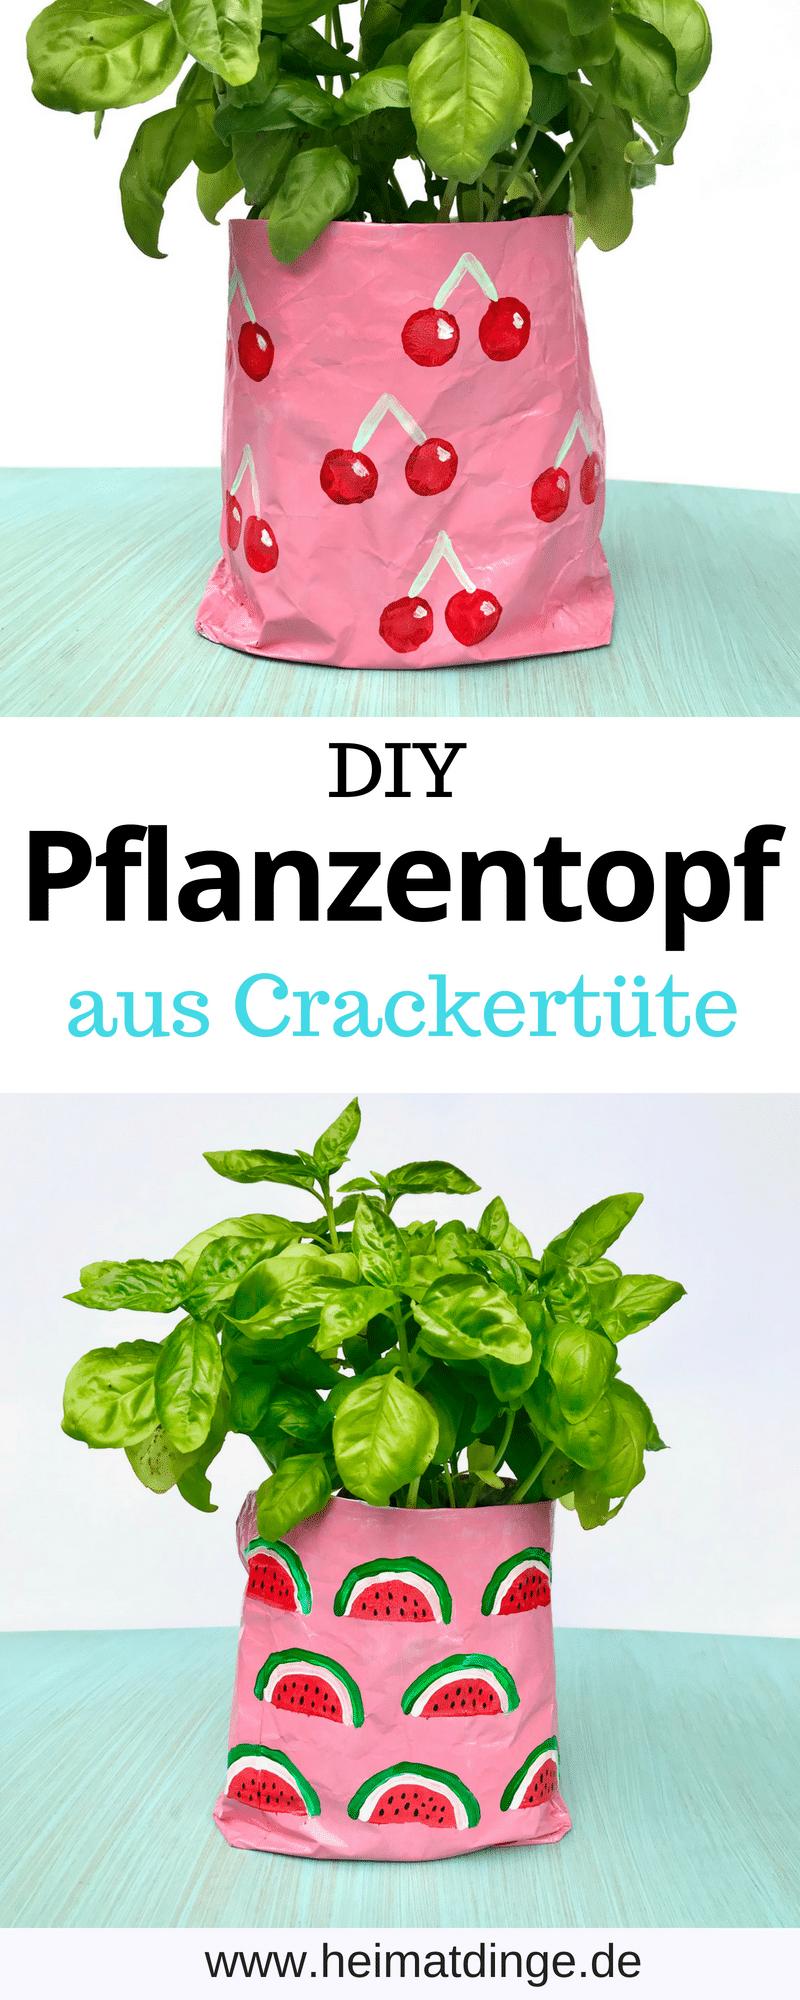 DIY Pflanzentopf aus Verpackung, Anleitung